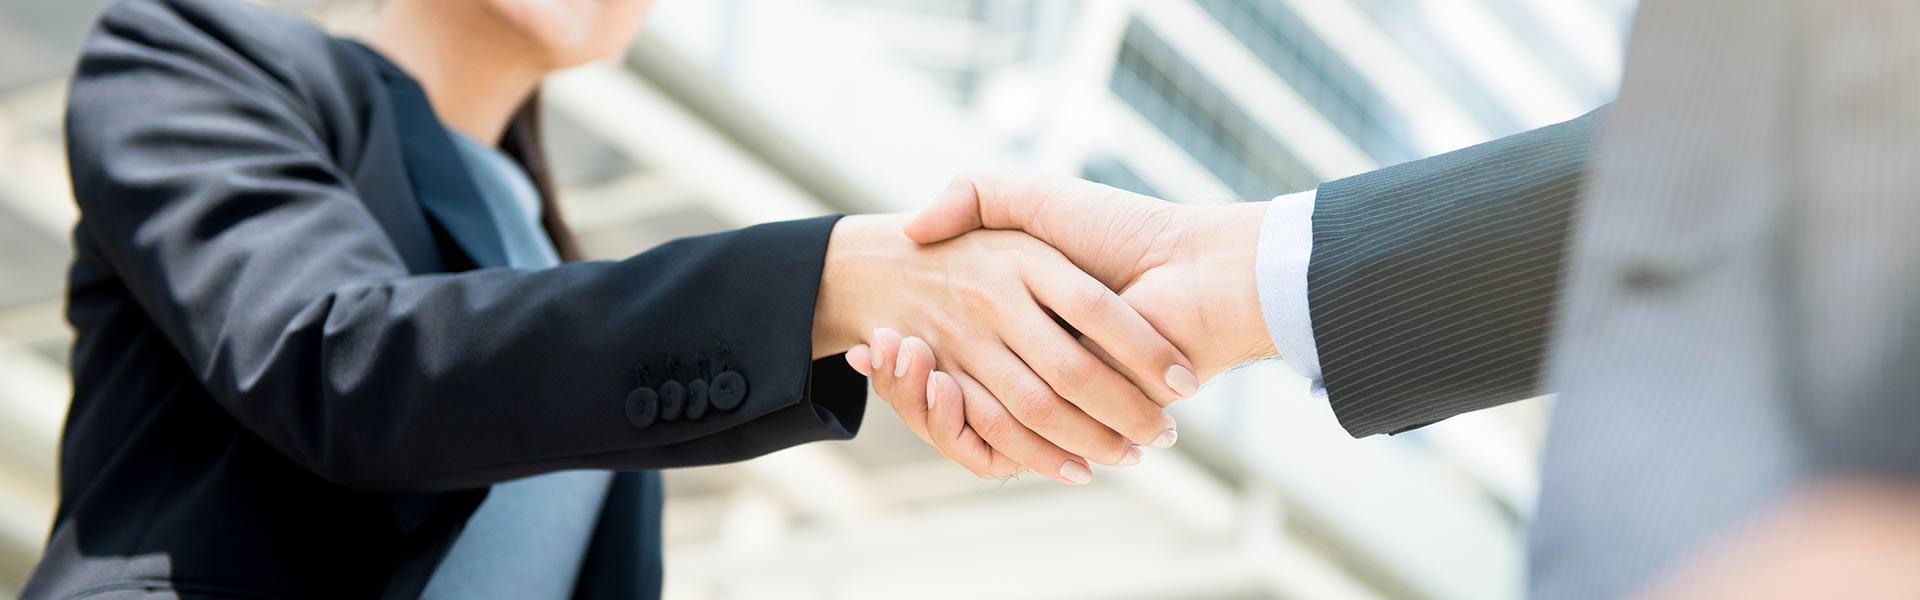 Businesswoman making handshake with a businessman